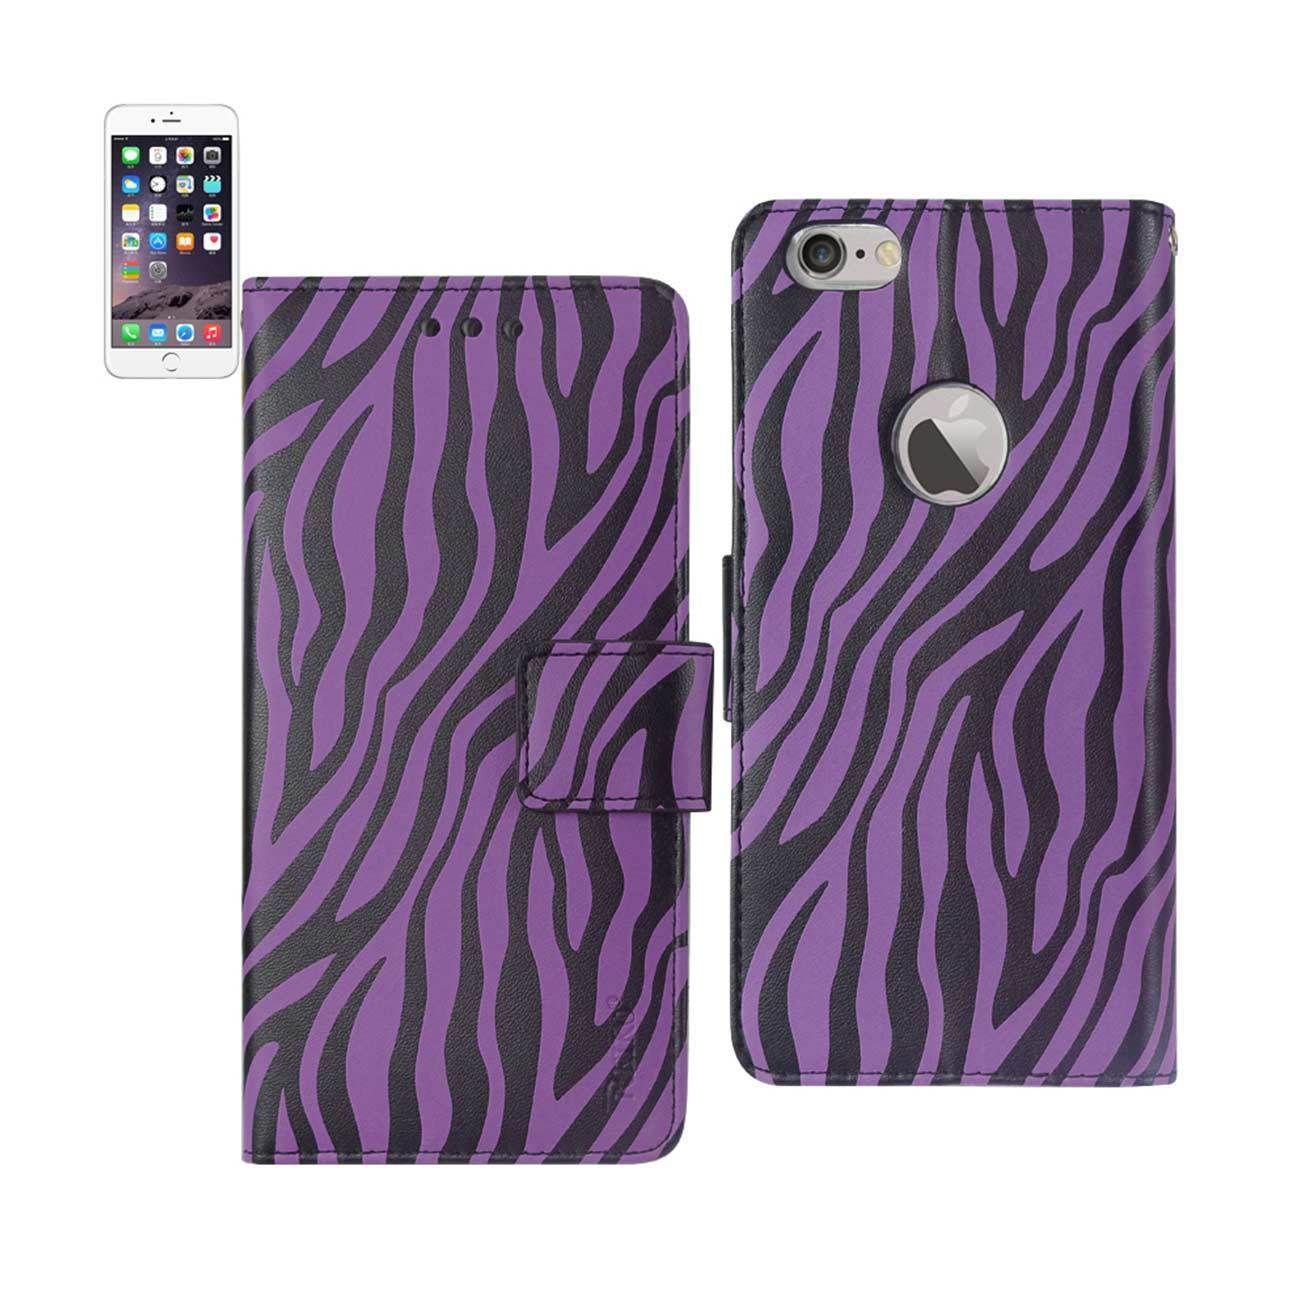 New Animal Zebra Print Wallet Case In Purple For iPhone 6 Plus 3-In-1